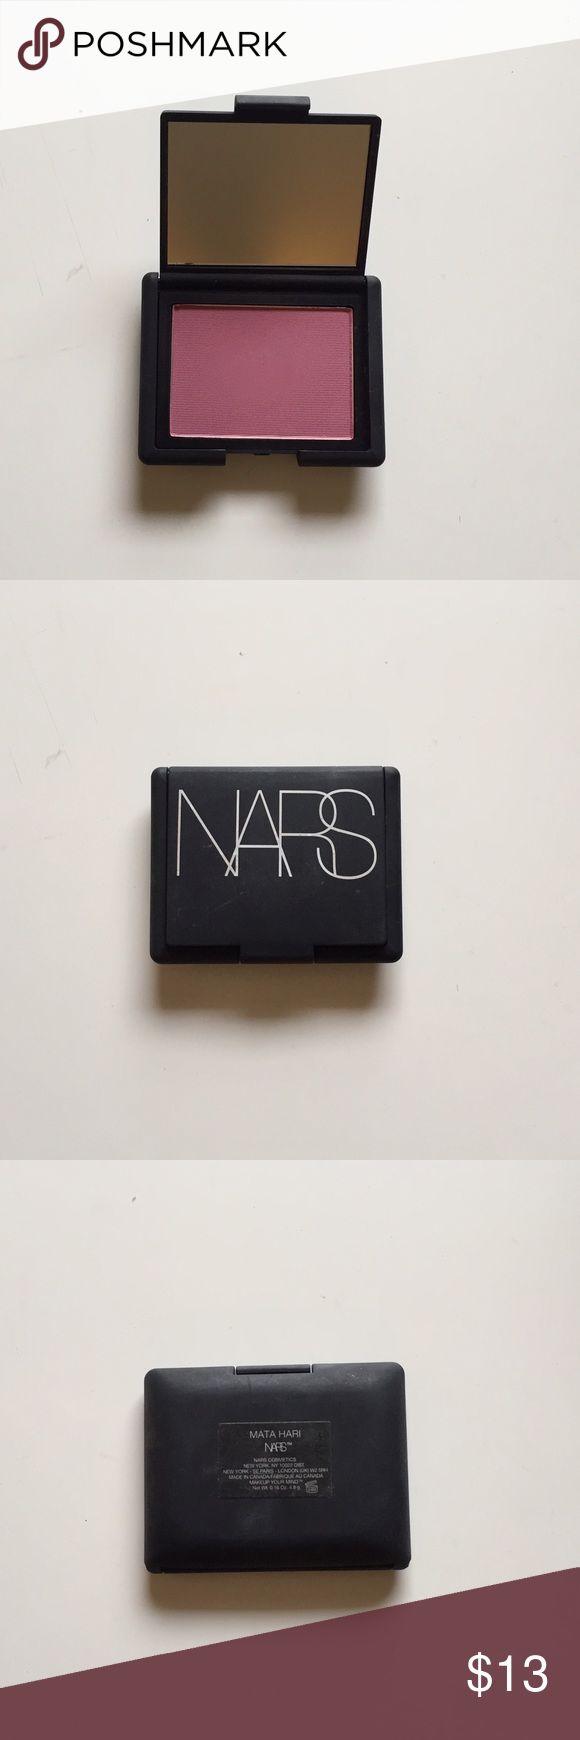 NARS Blush in Mata Hari NRA Blush in Mata Hari, full-sized product. Used three times with clean brush. MAC Cosmetics Makeup Blush